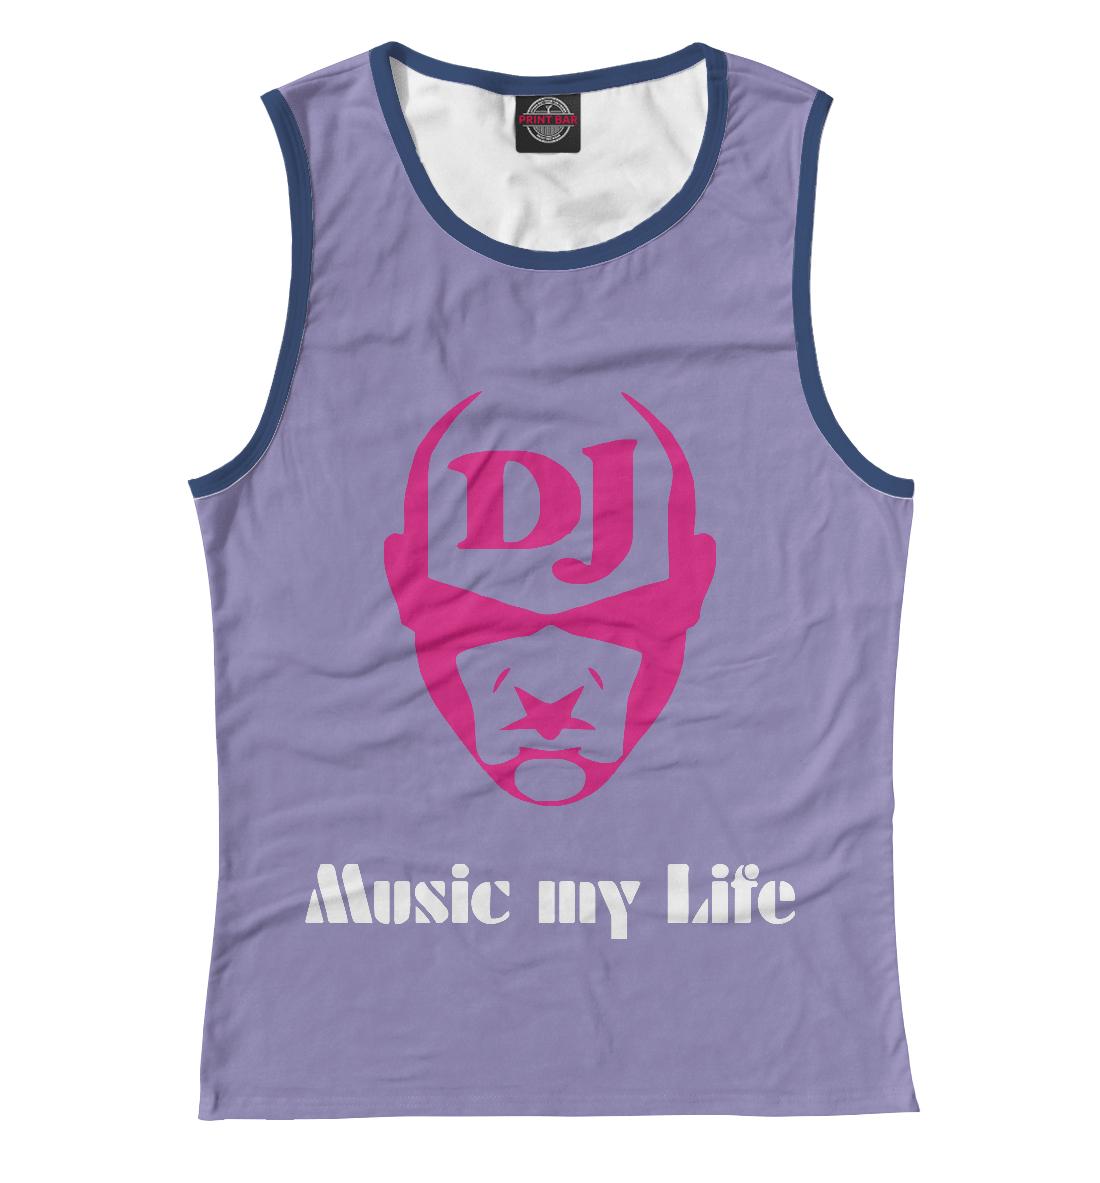 Music my life mikael niemi popular music